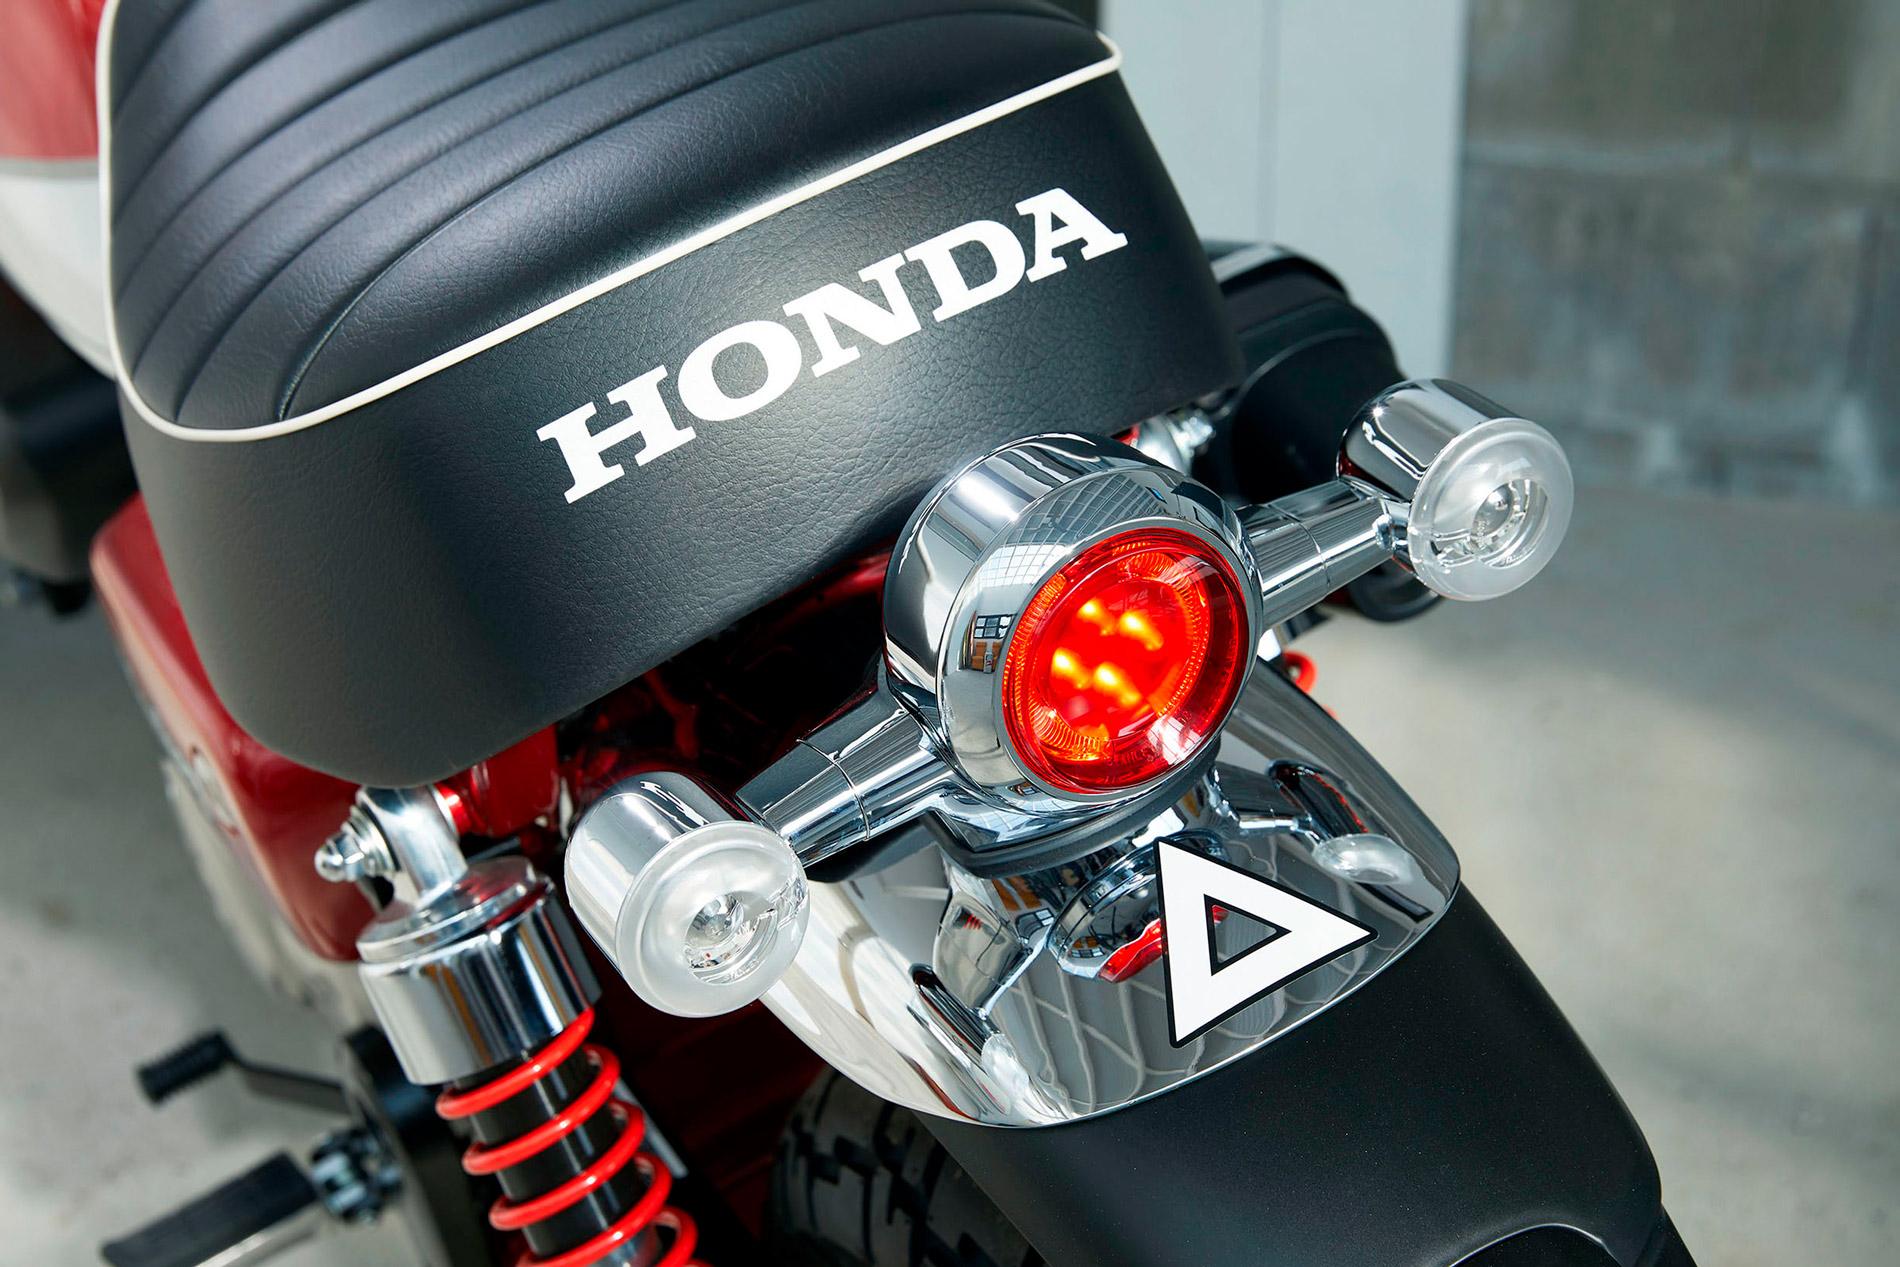 2019 Honda Monkey 125cc Motorbike Scooters Ltd 1960s Motorcycles Motorcycle Back View